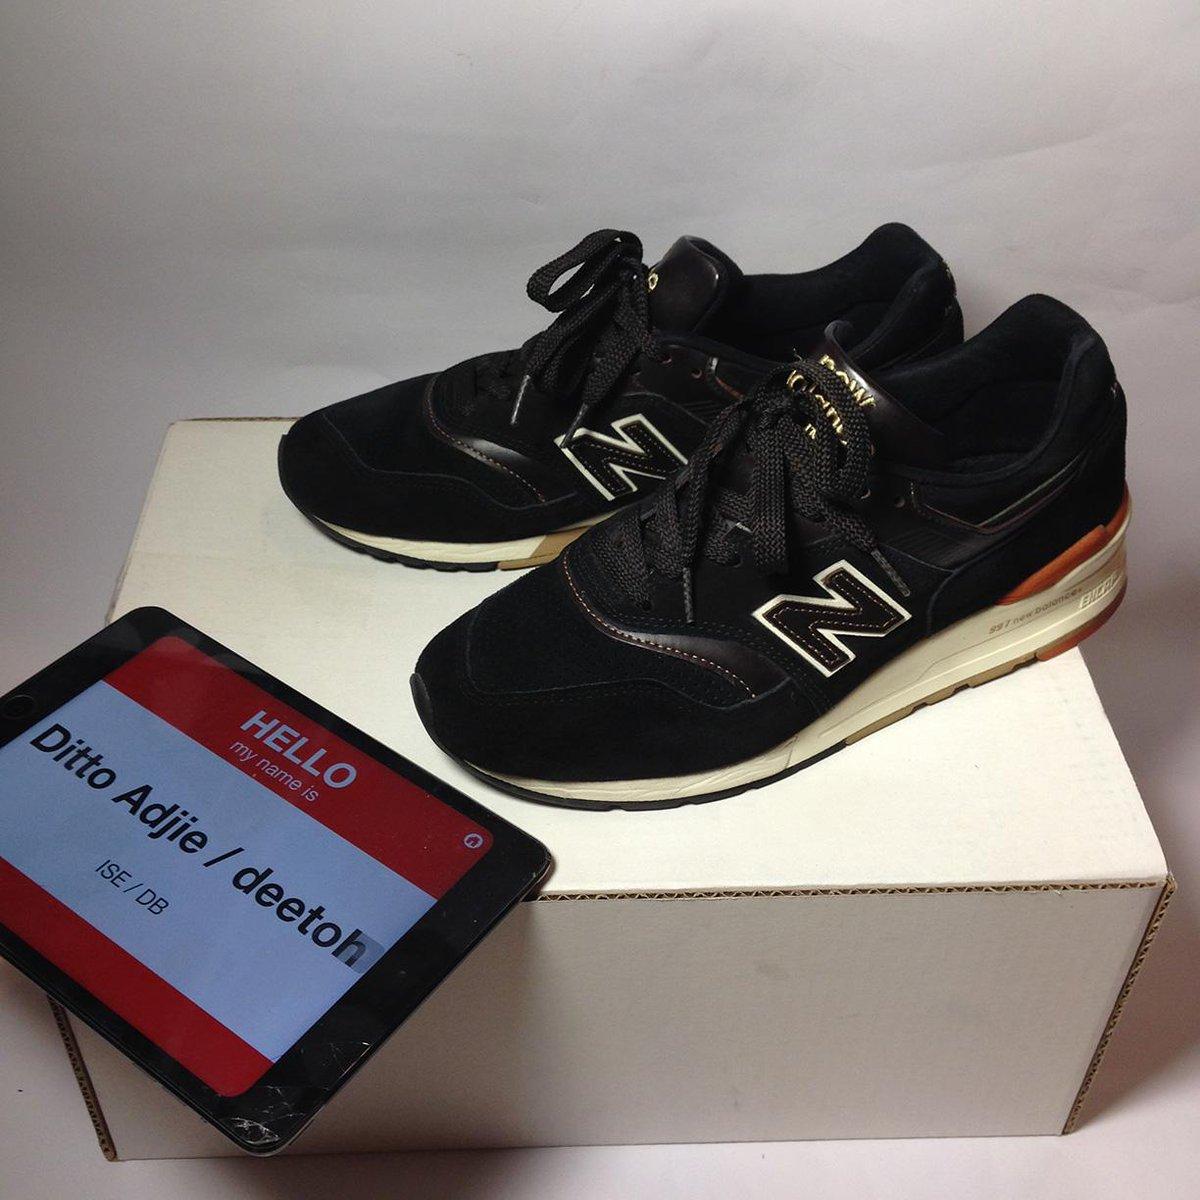 @AtengShop @GoedStuff @PJP_Shoes @great_kicks NB 997 PR sz 8.5 US 3,5 jt 0812 8624 9515 / Line: dittopadjie http://t.co/guqXrVxIW3